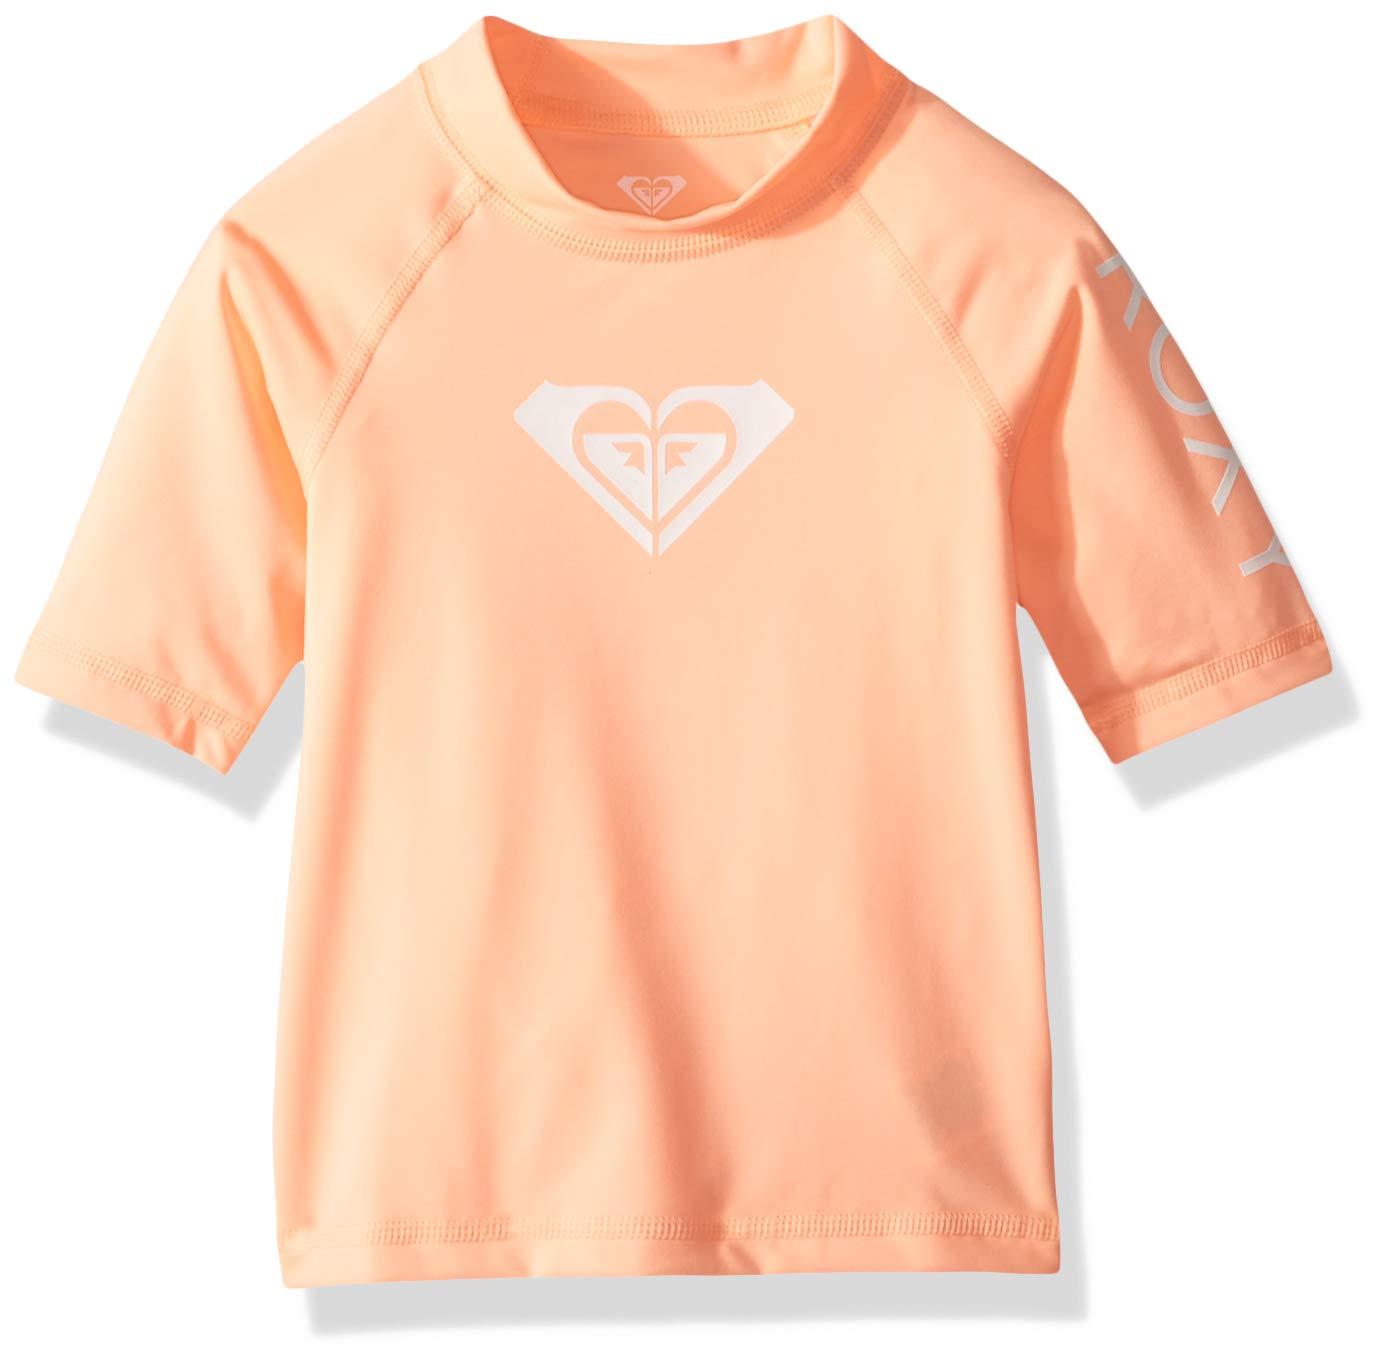 Roxy Toddler Girls' Whole Hearted Short Sleeve Rashguard, 2